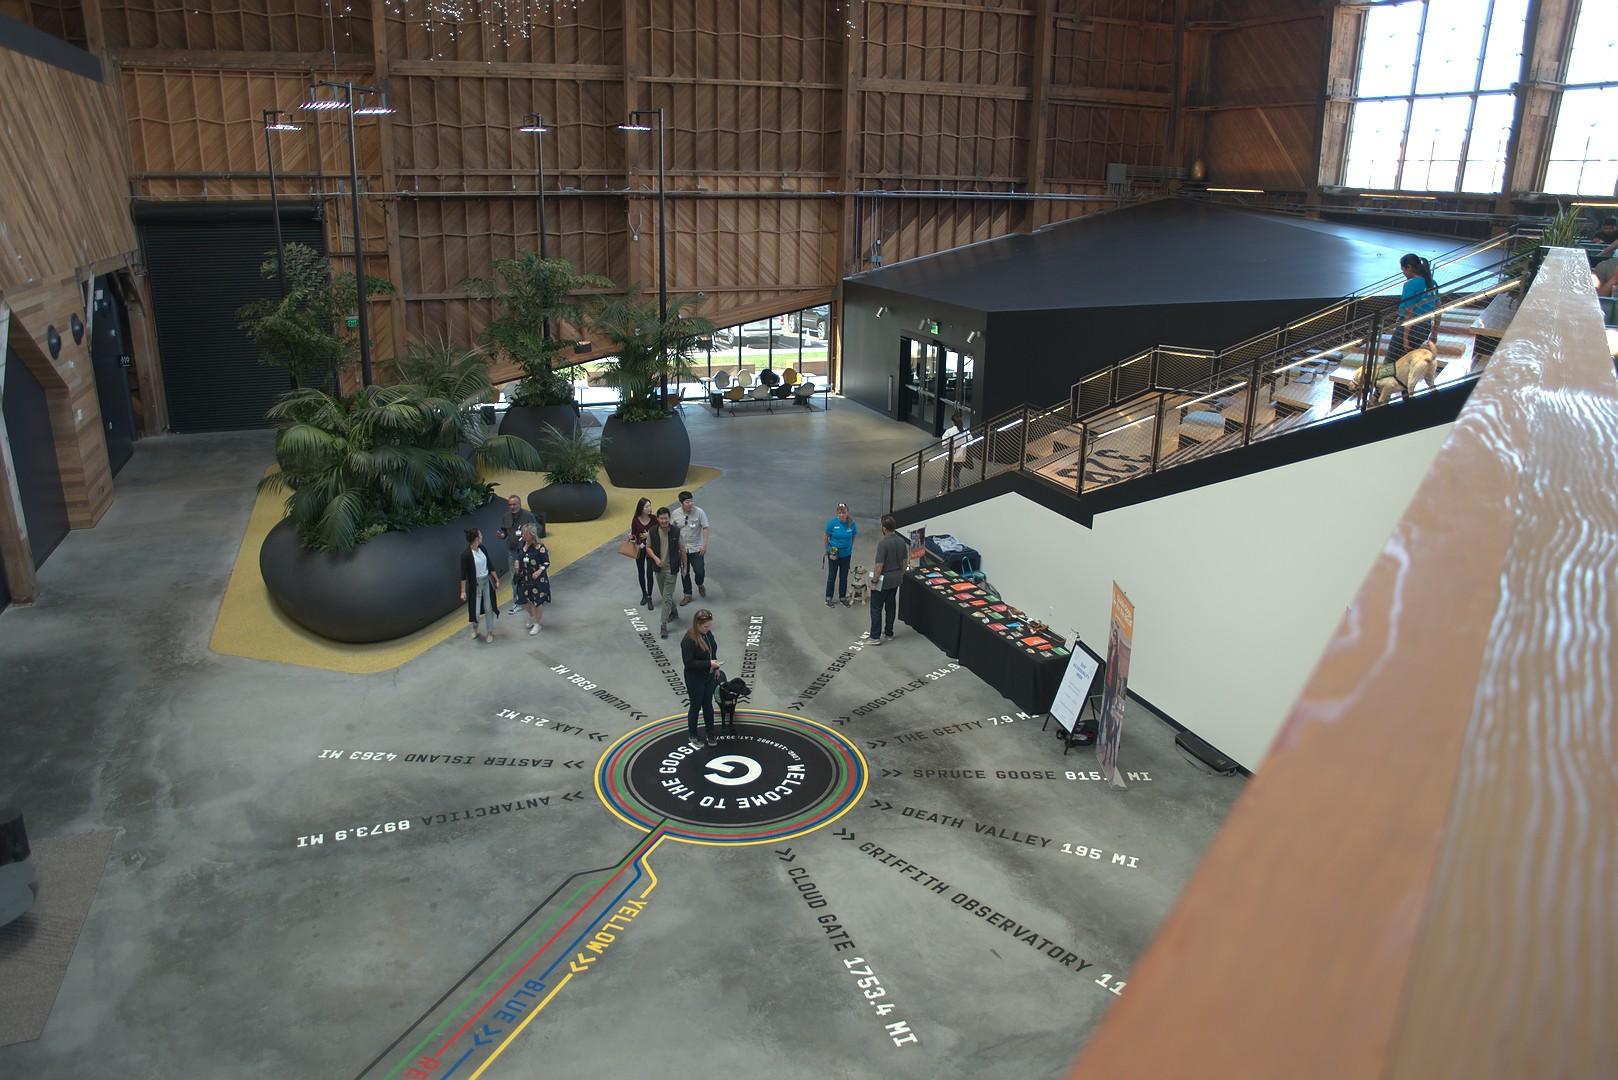 LASW at Google Spruce Goose